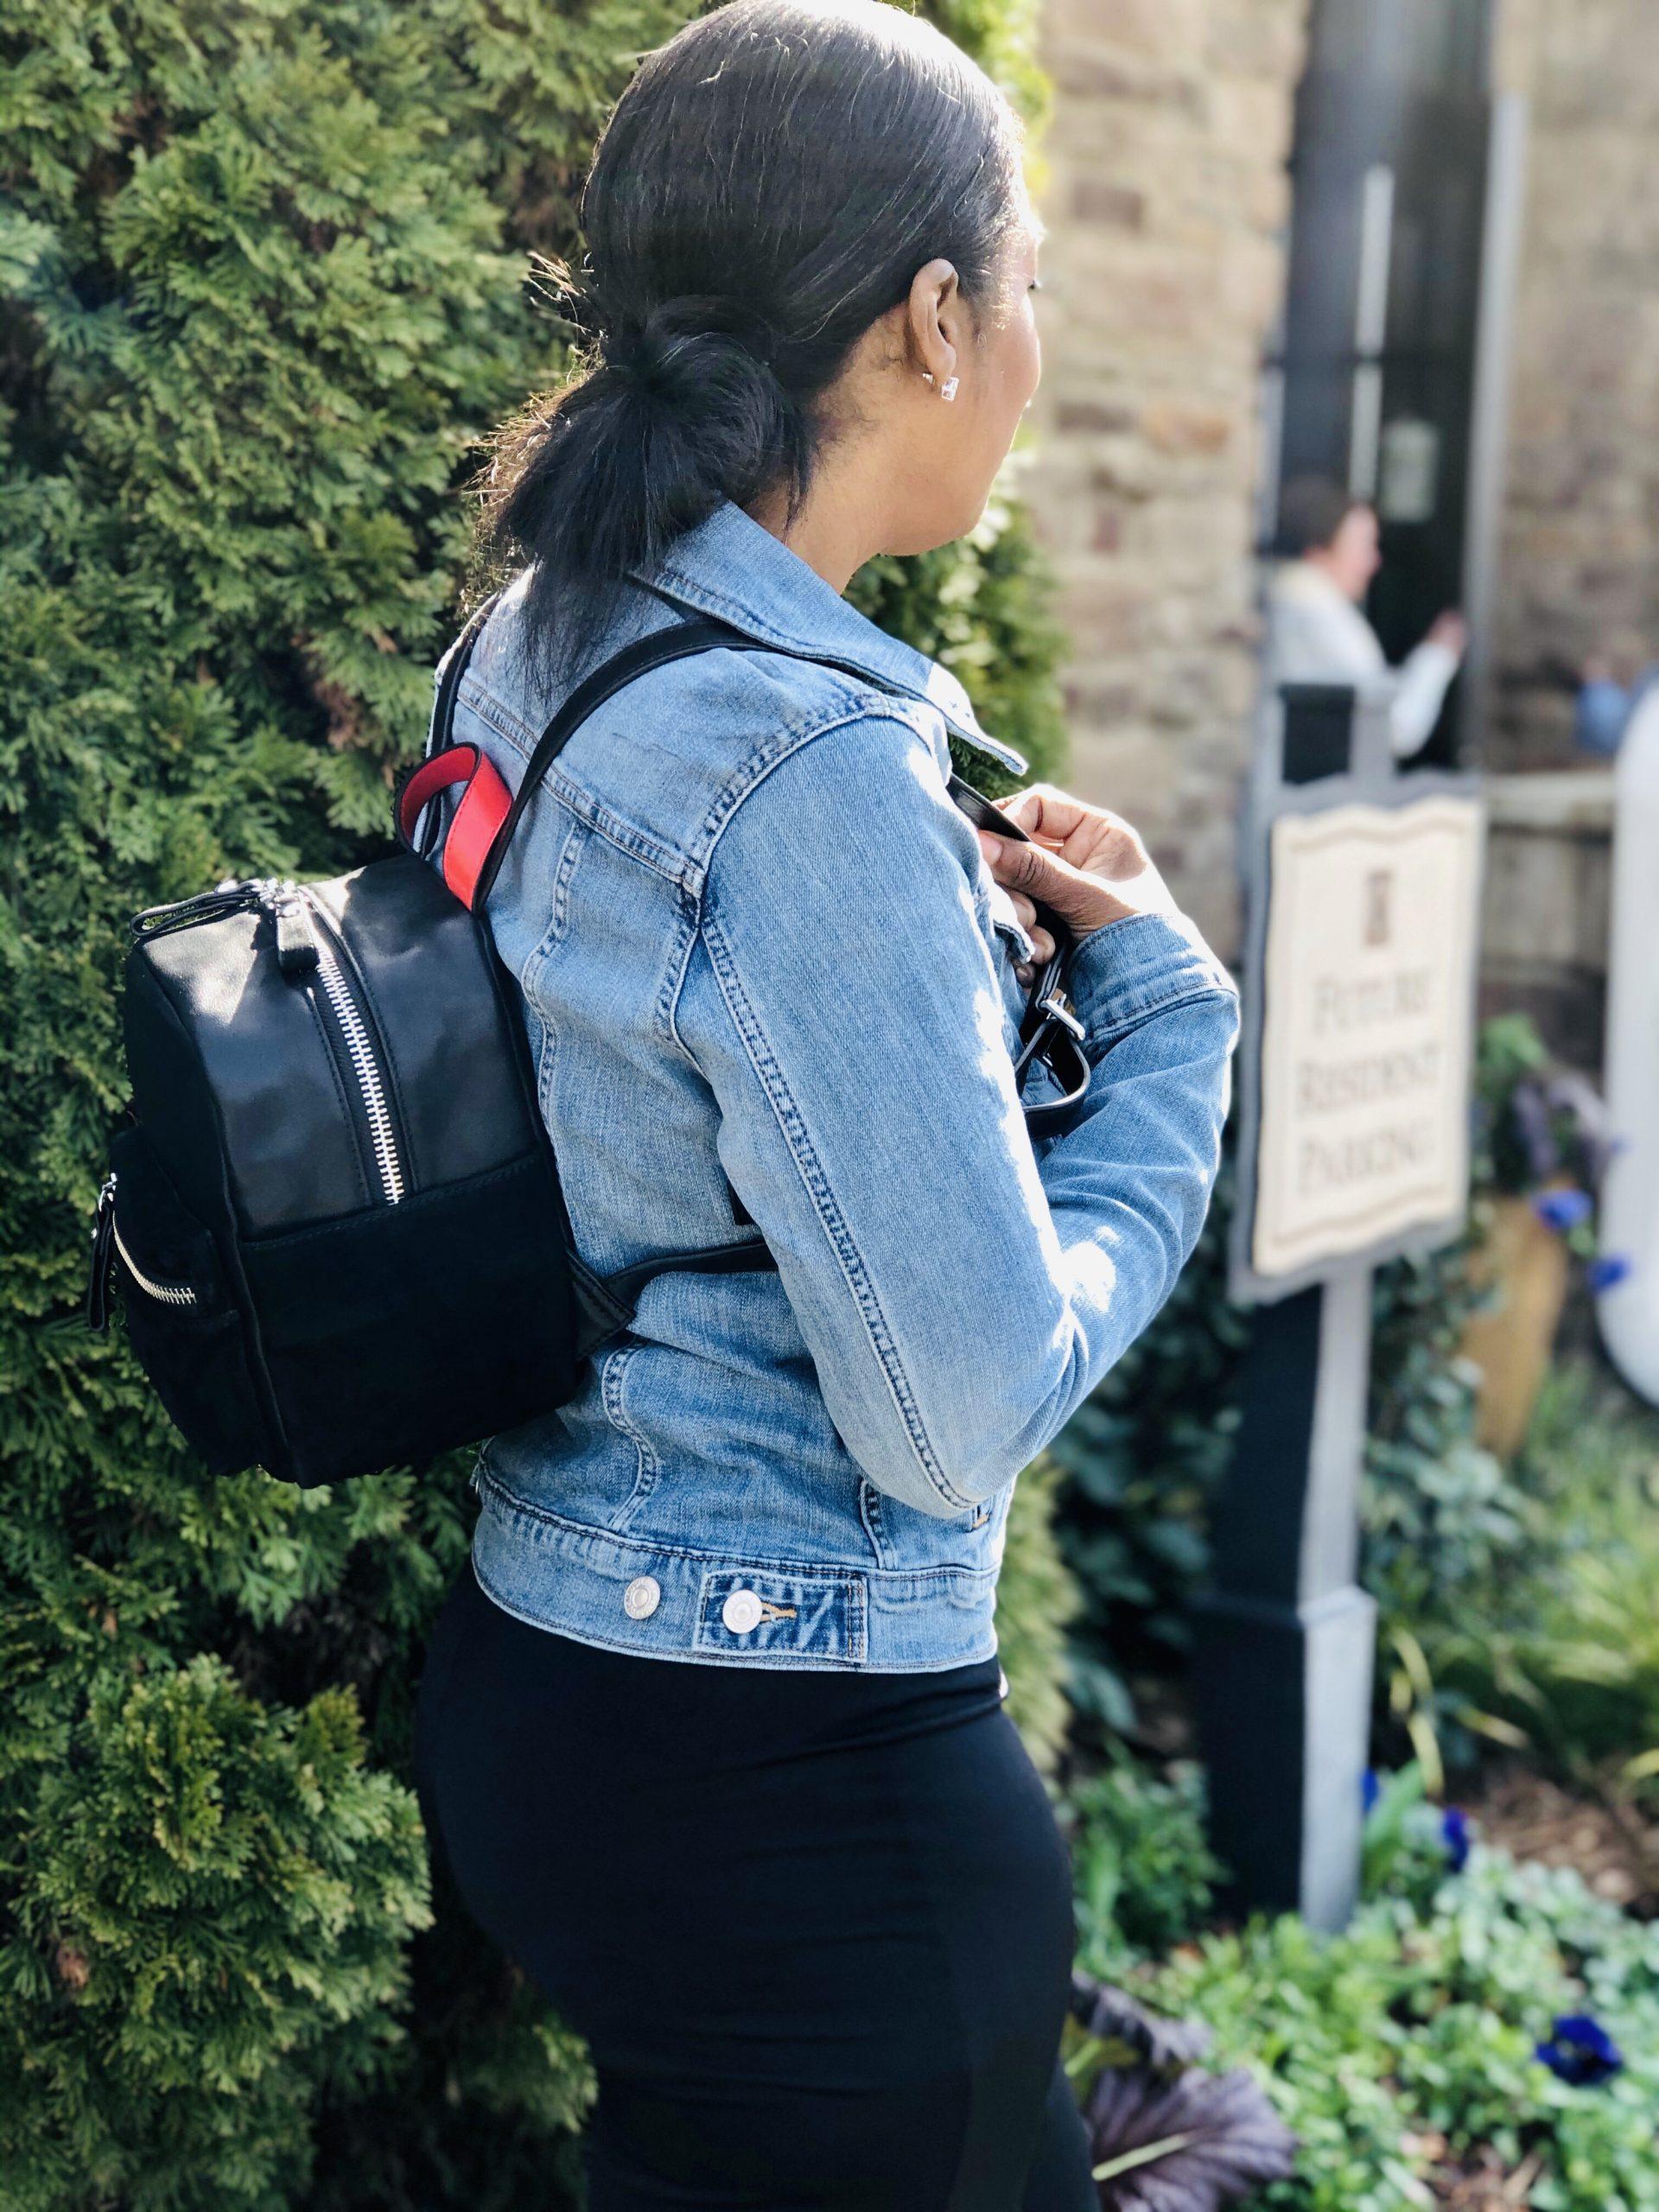 My Style: CB Vior Maverick Mini Backpack